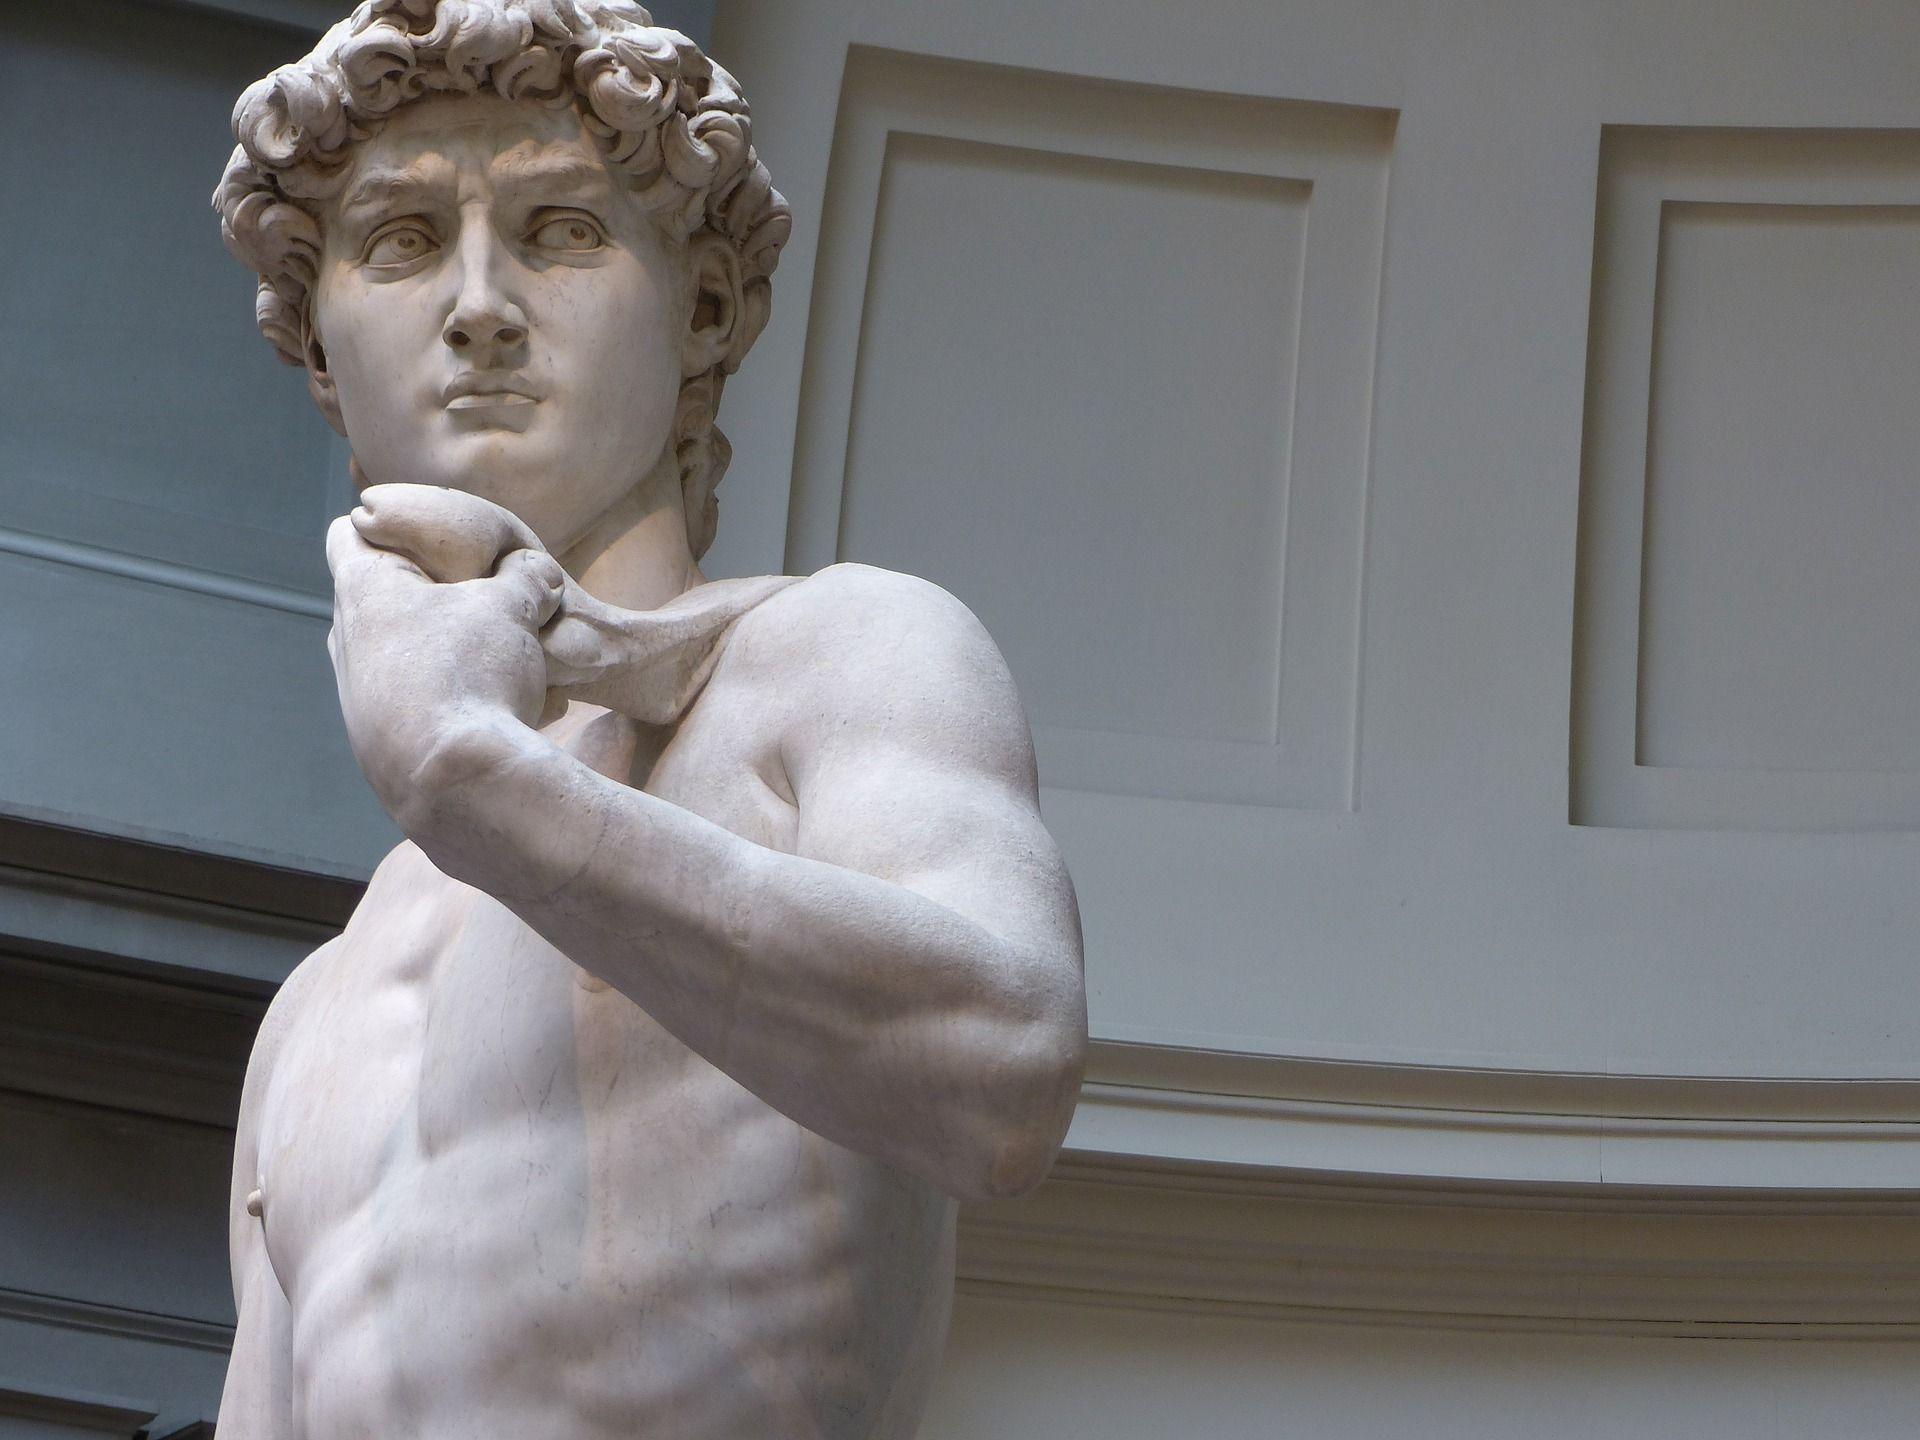 statue of David, Michelangelo, most important renaissance artists